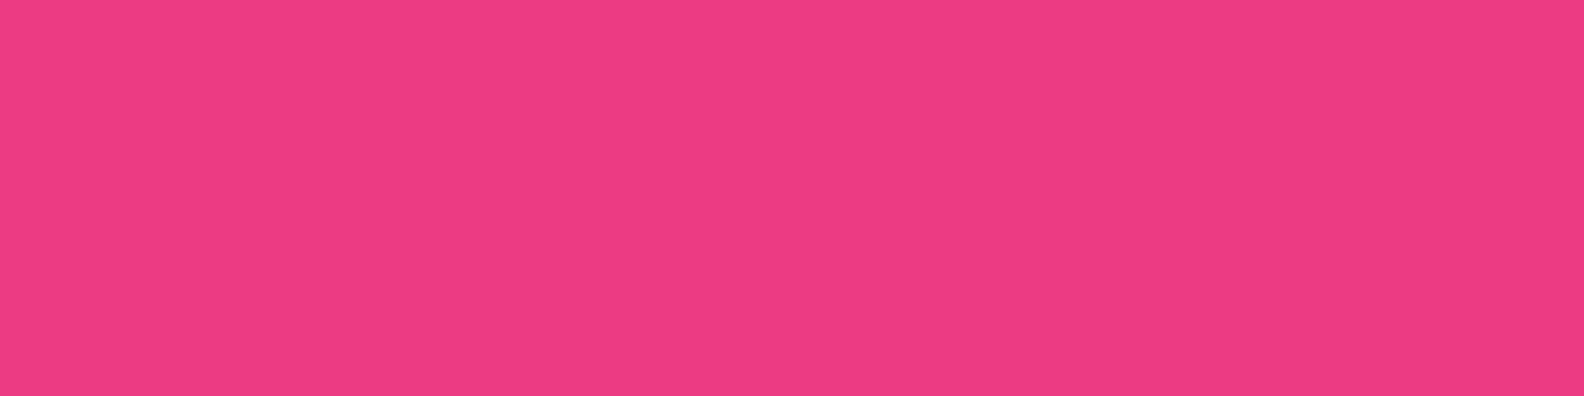 1584x396 Cerise Pink Solid Color Background